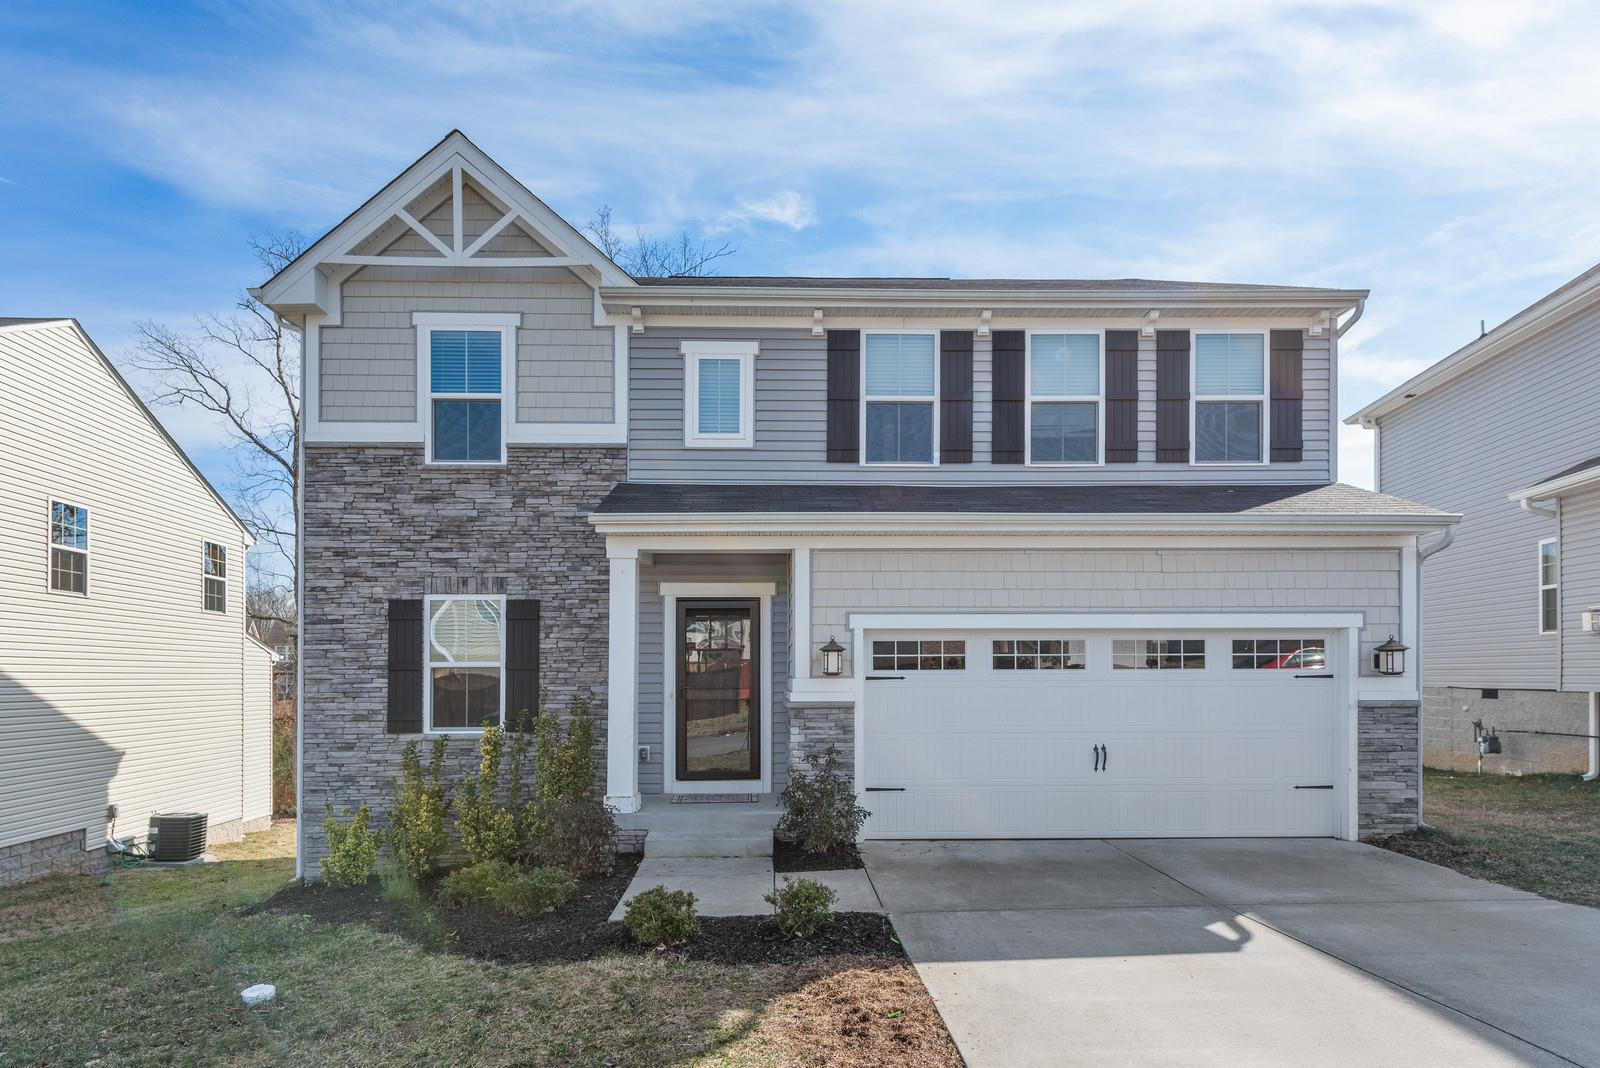 4261 Sandstone Dr, Antioch, TN 37013 - Antioch, TN real estate listing